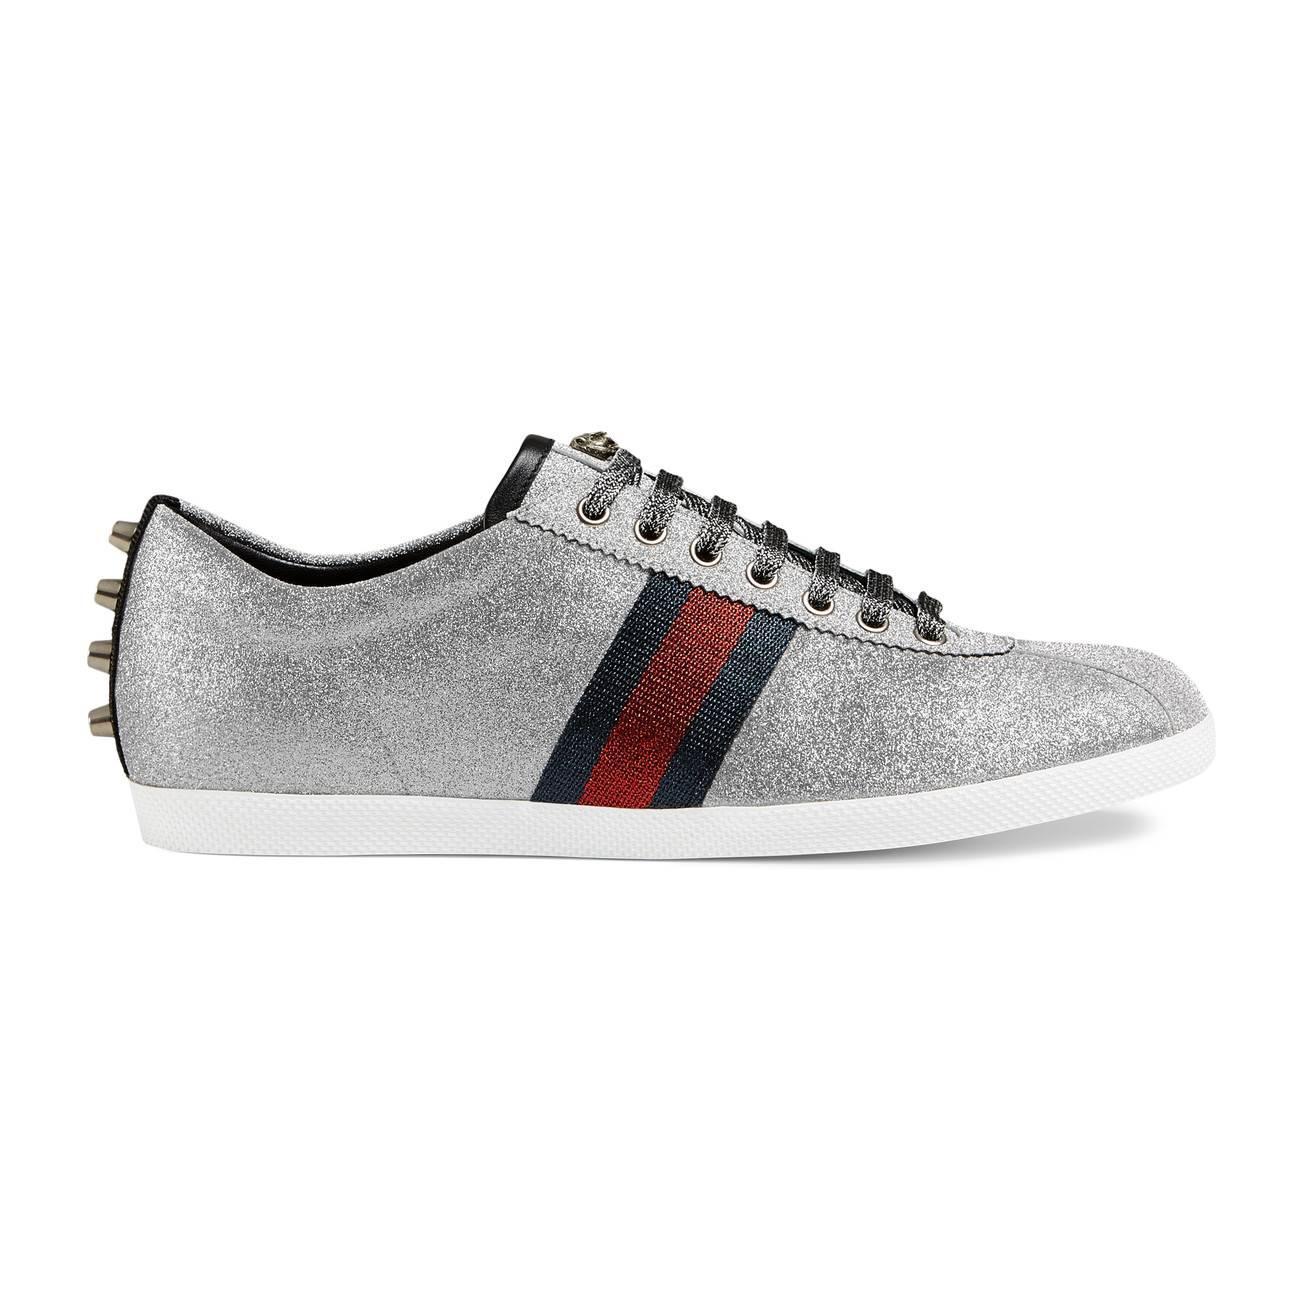 Gucci Glitter Web Studded Sneaker in